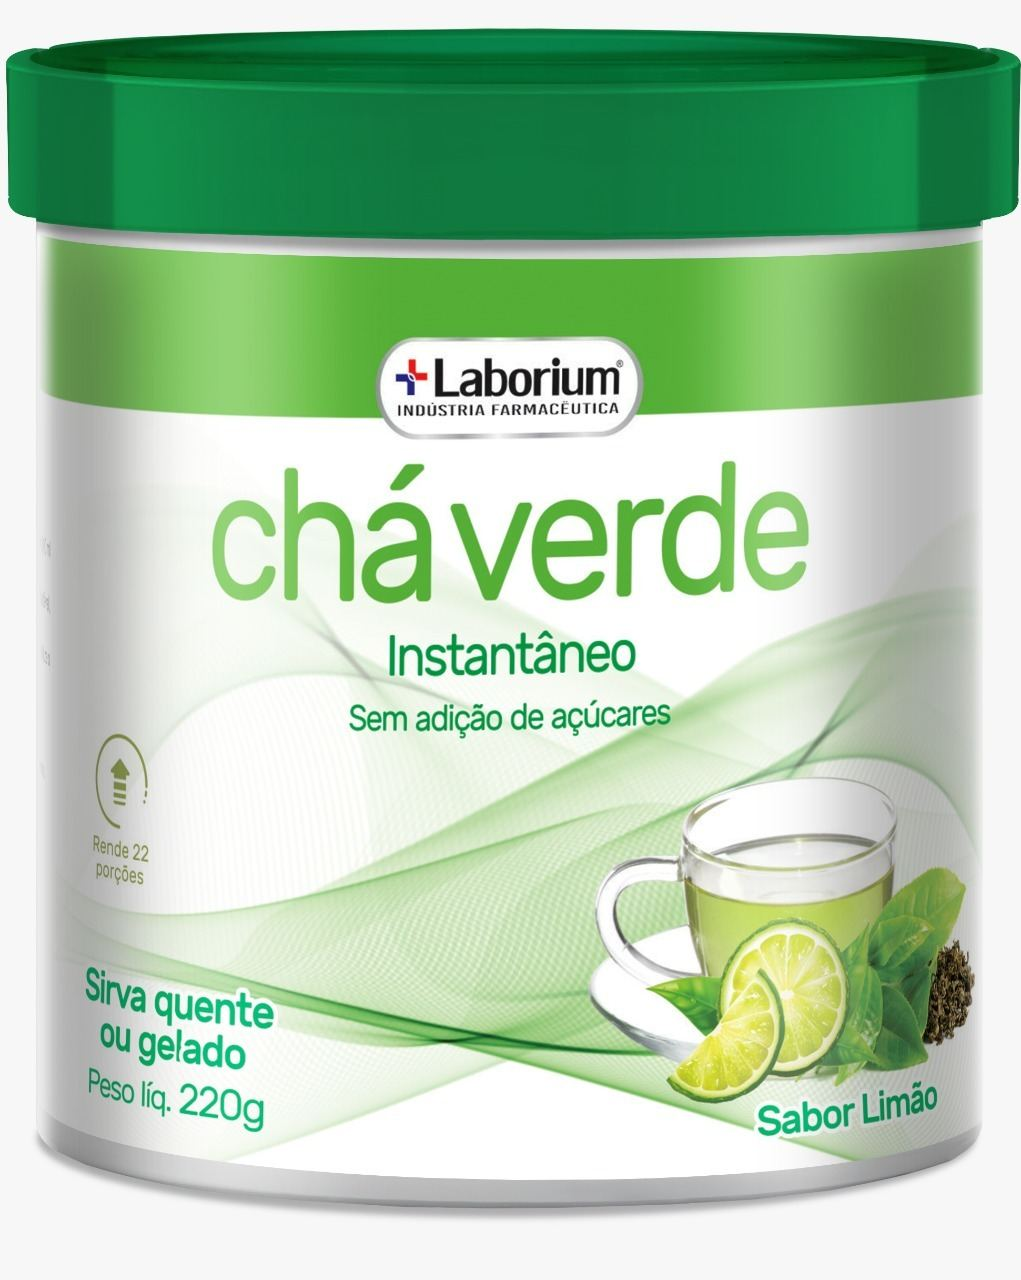 Chá Verde Instantâneo - Taurina/ Stévia 220g - Laborium